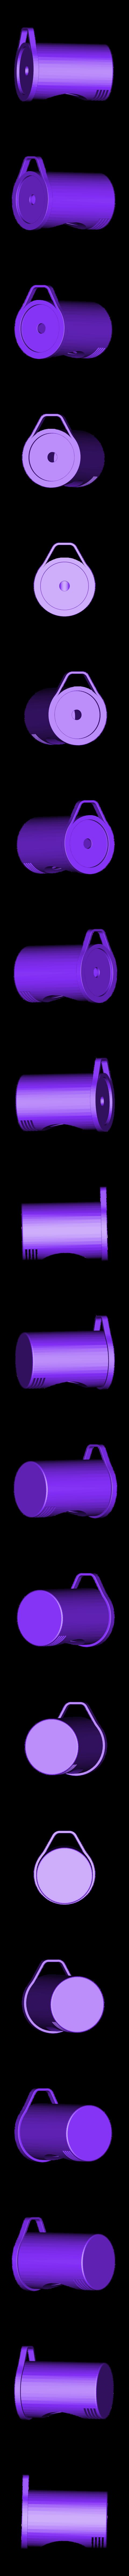 ff - ff6-1.STL Download STL file Folding Table Fan • 3D printer object, Dekro